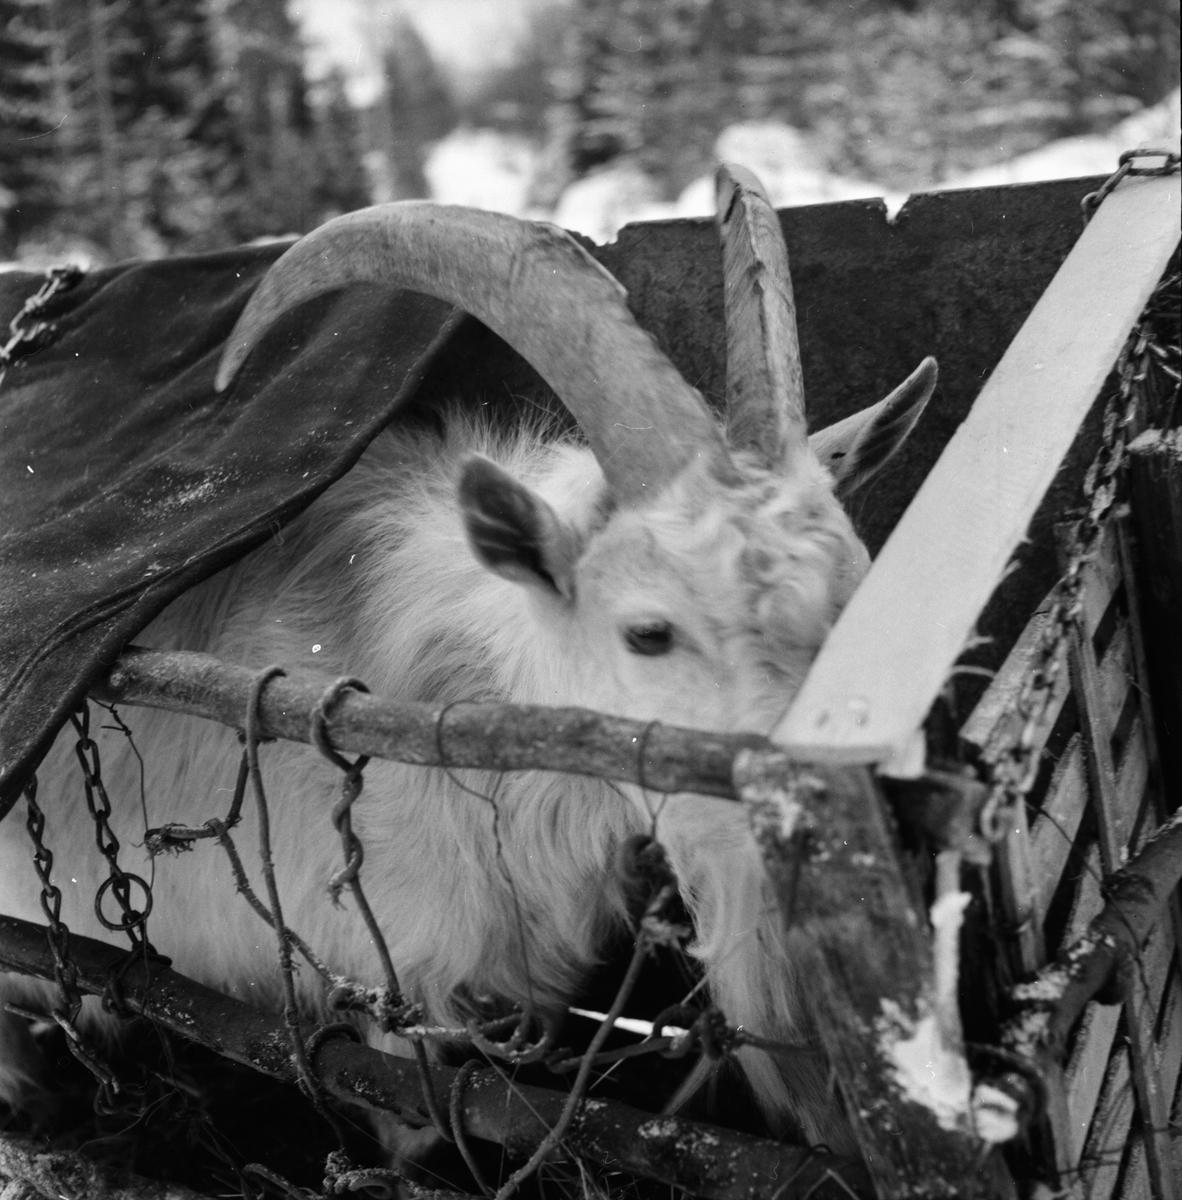 Nordkvist,Karl-Rune,författare i Mörtsjö 28 jan 1960